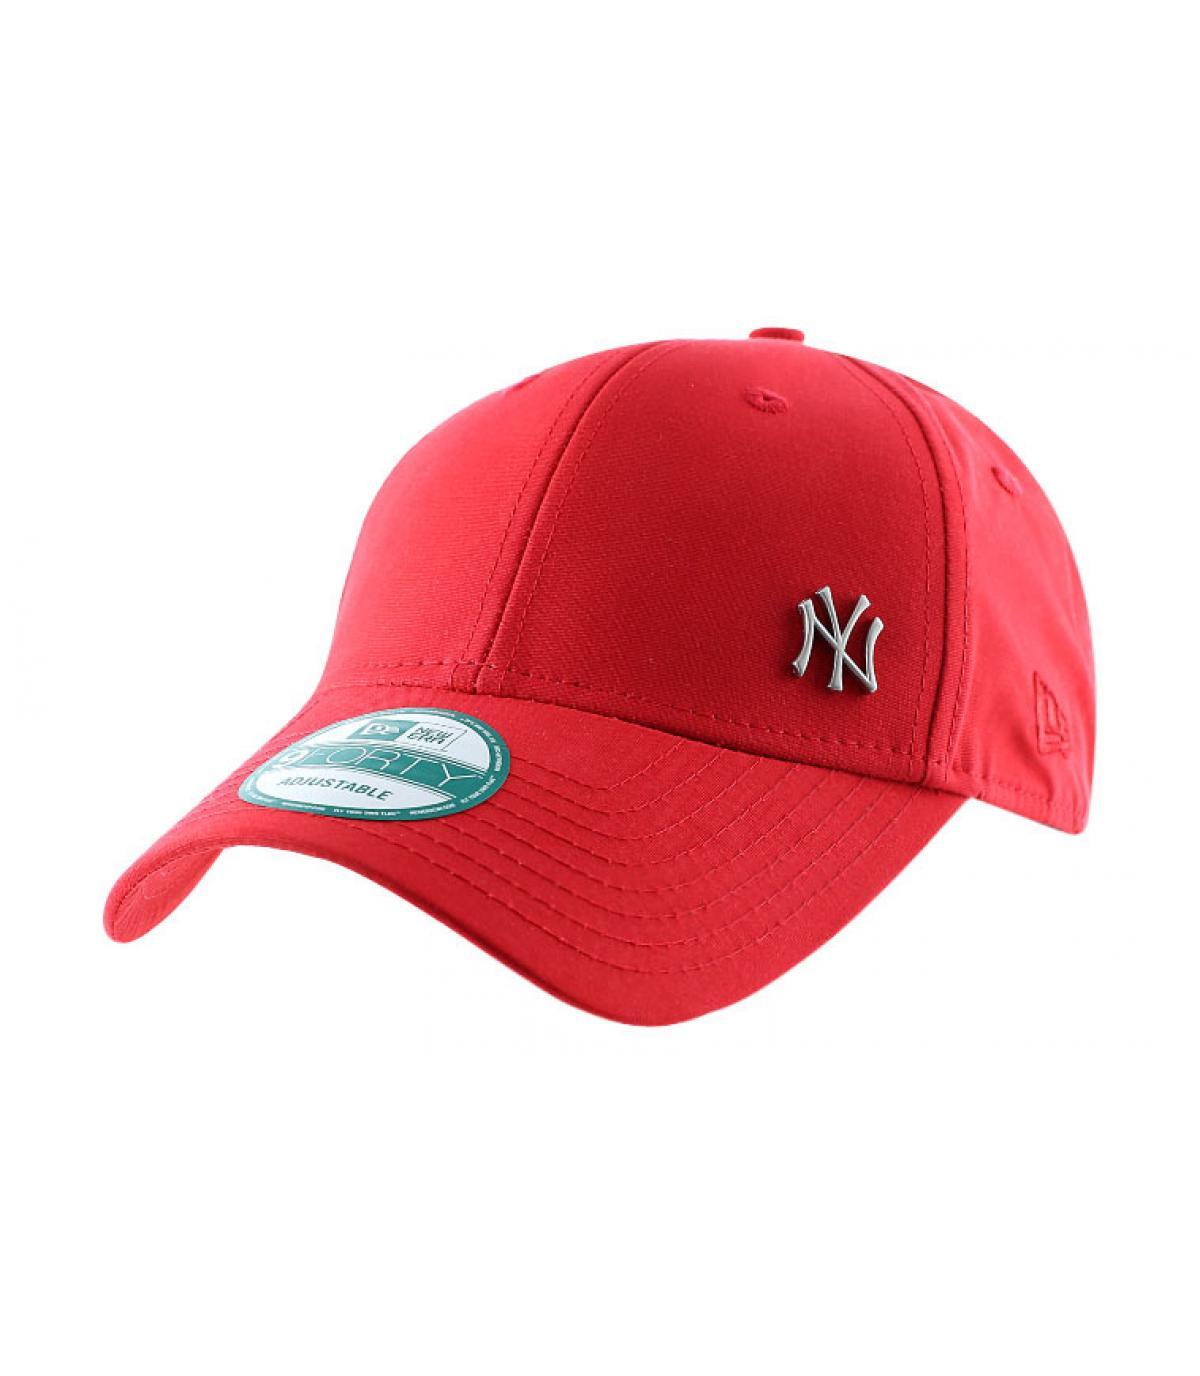 Black New Era cap - MLB flawless logo NY red cap by New Era. Headict fb7c5d0e28a